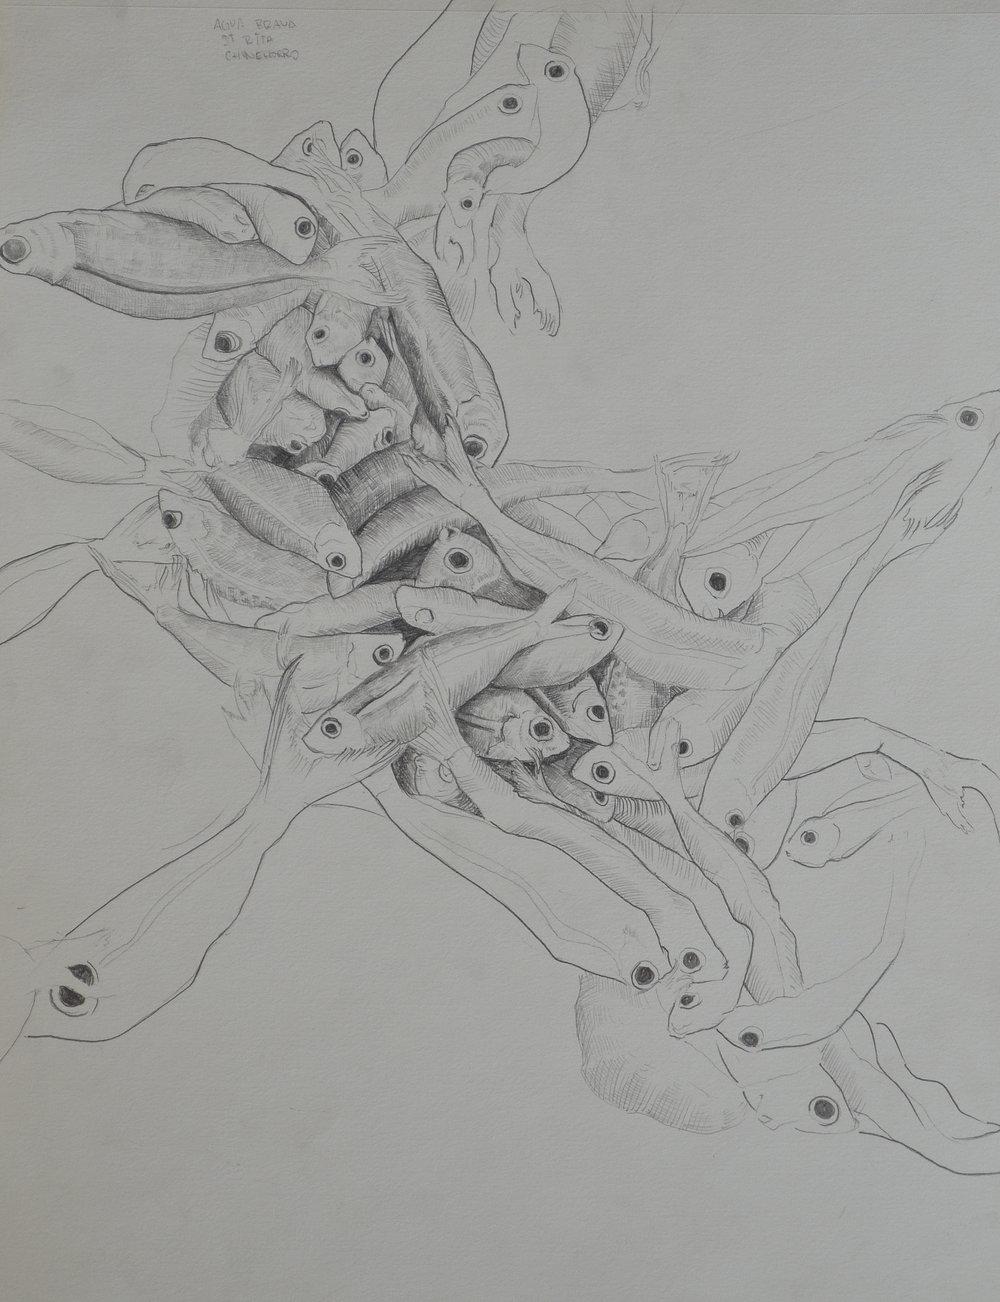 peces 1. lápiz sobre papel. 25 x 35 cm